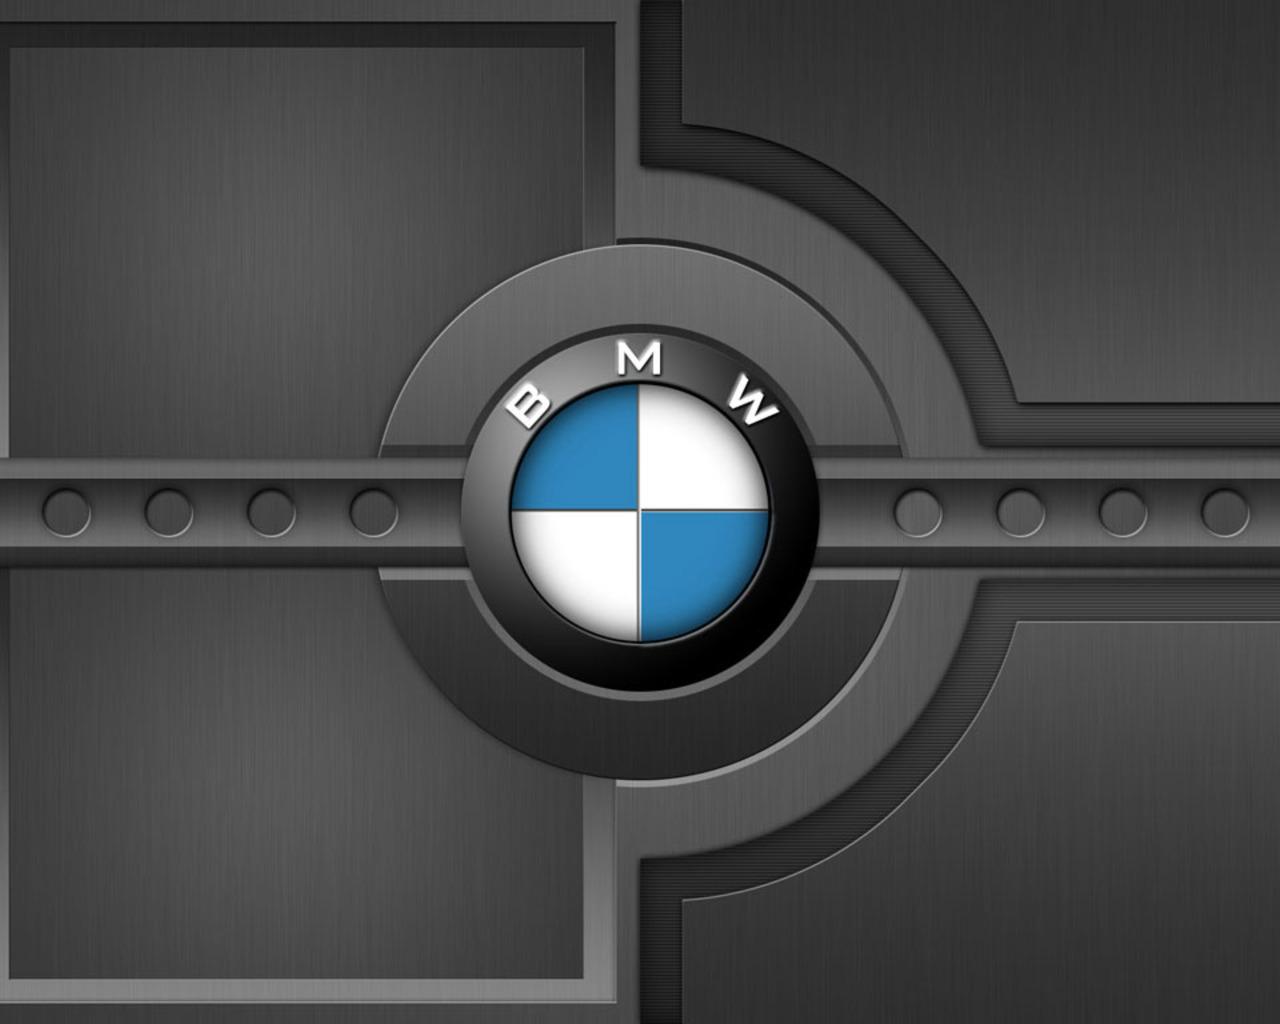 my logo pictures bmw logos